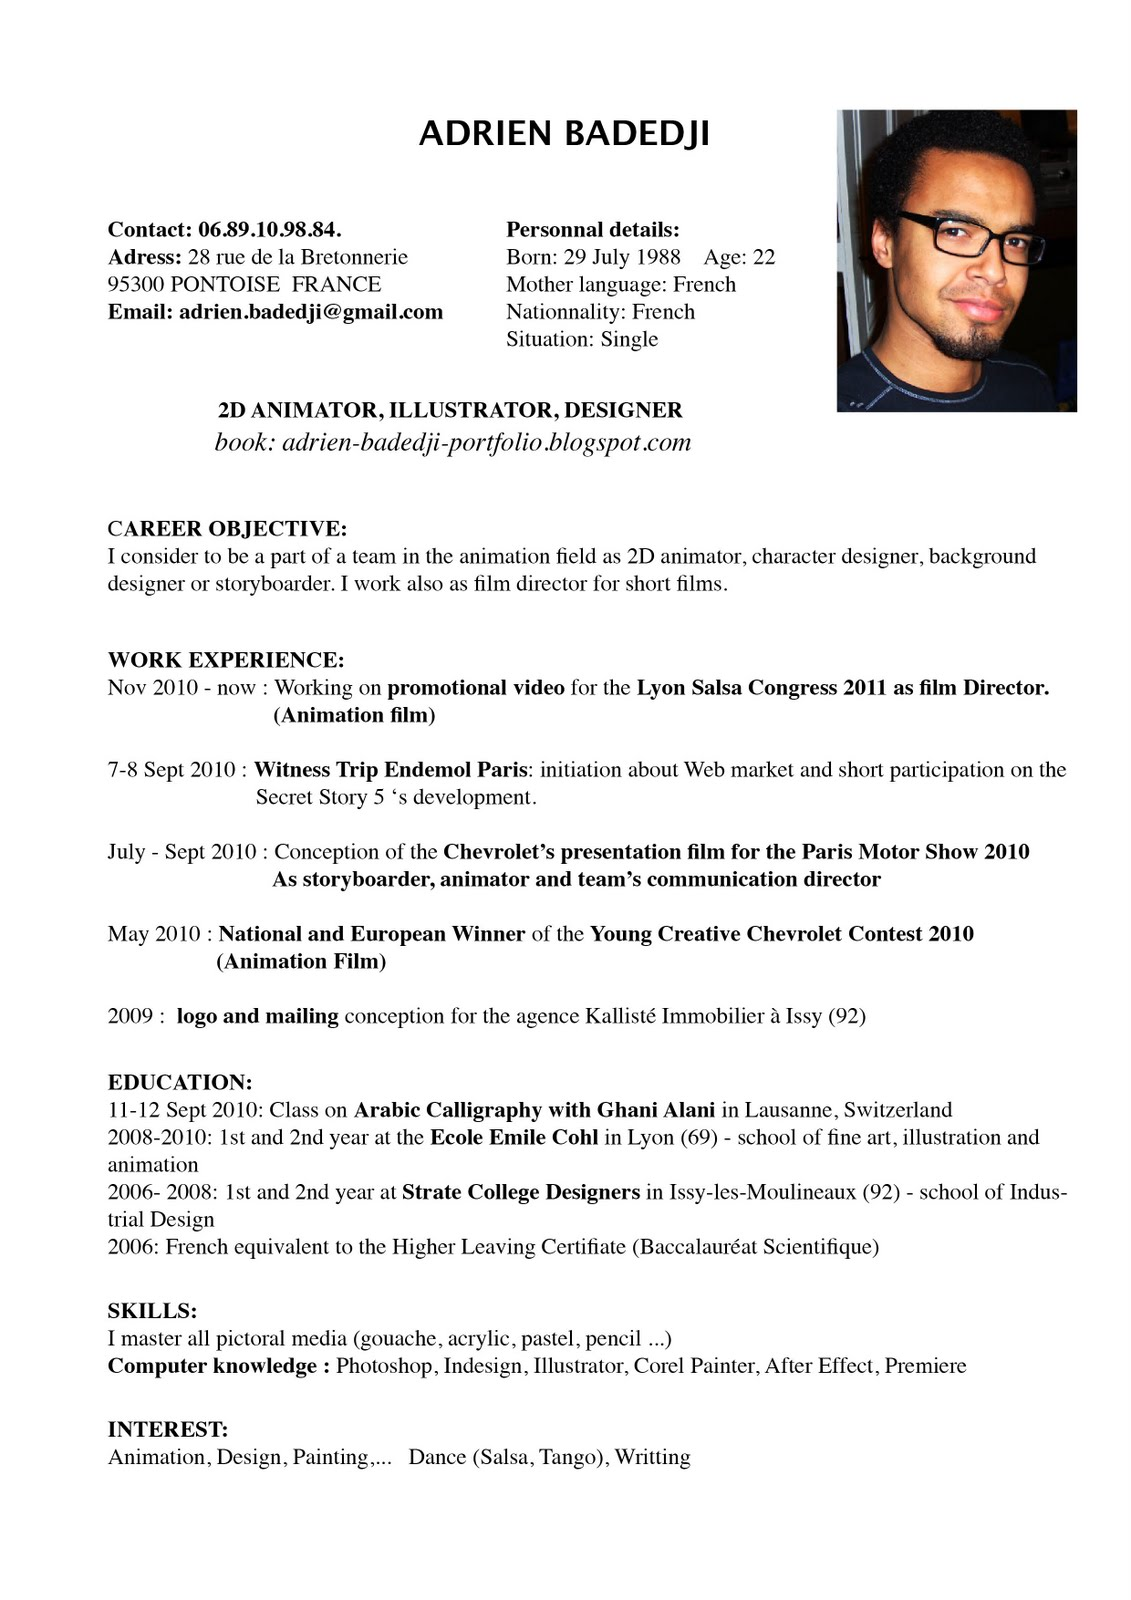 students cv samples pdf resume sample students cv samples pdf samples for academic positions ucsf career professional curriculum vitae samples cv resume